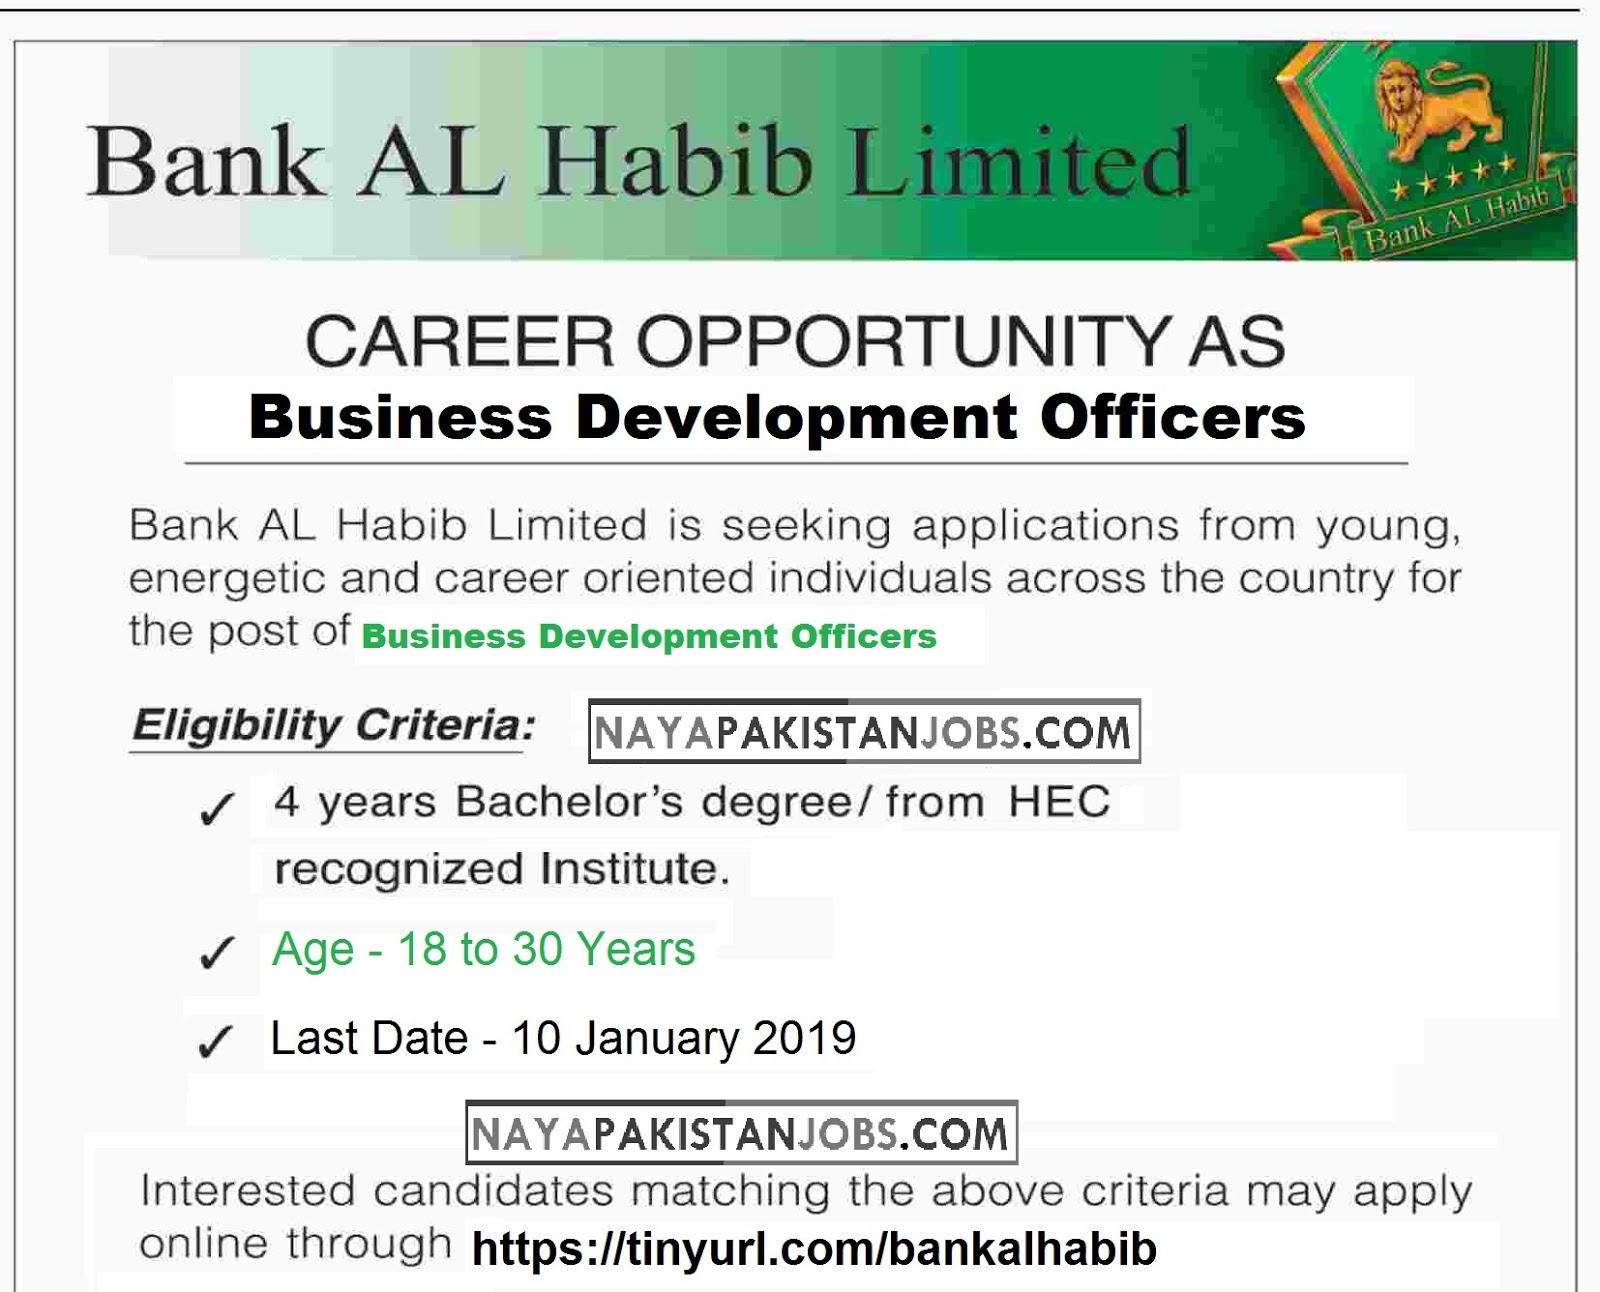 Bank Al Habib Jobs 2019, Business Development Officers Jobs, Latest Vacancies Announced in www.bankalhabib.com Bank Al Habib for Business Development Officers – Islamic Banking 16 December 2018 - Naya Pakistan